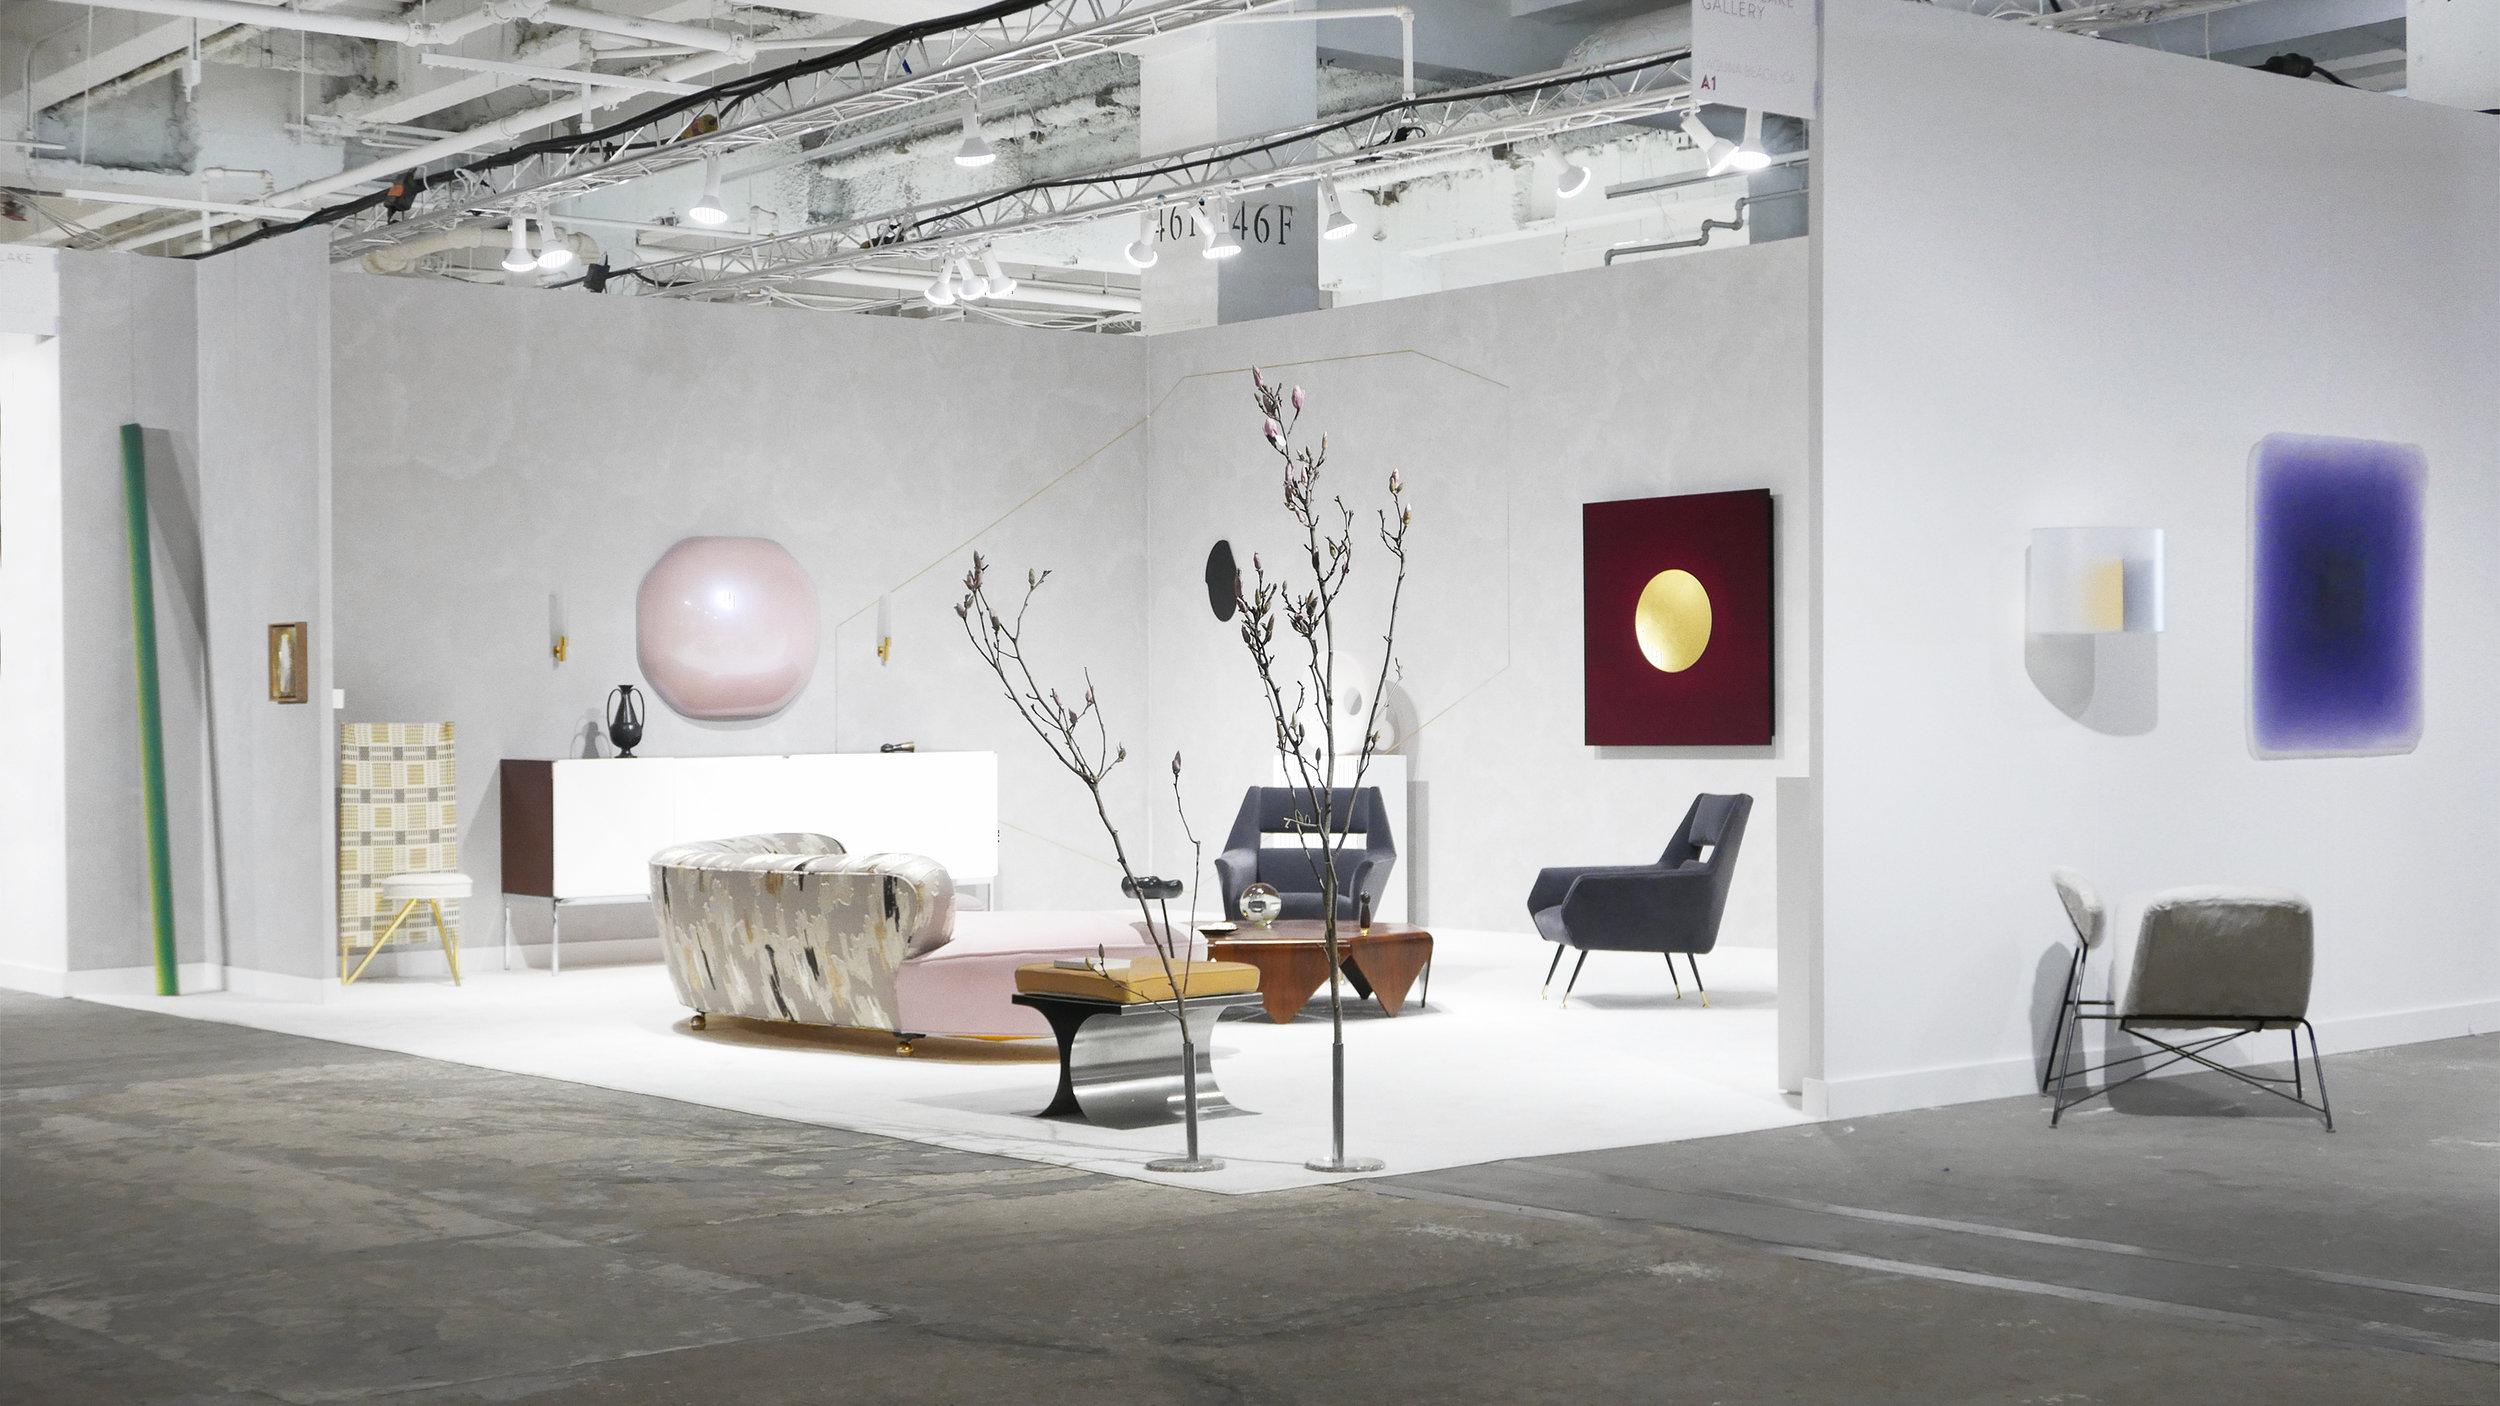 Collective Design New York 2018_Peter Blake Gallery_Installation View_2.jpg